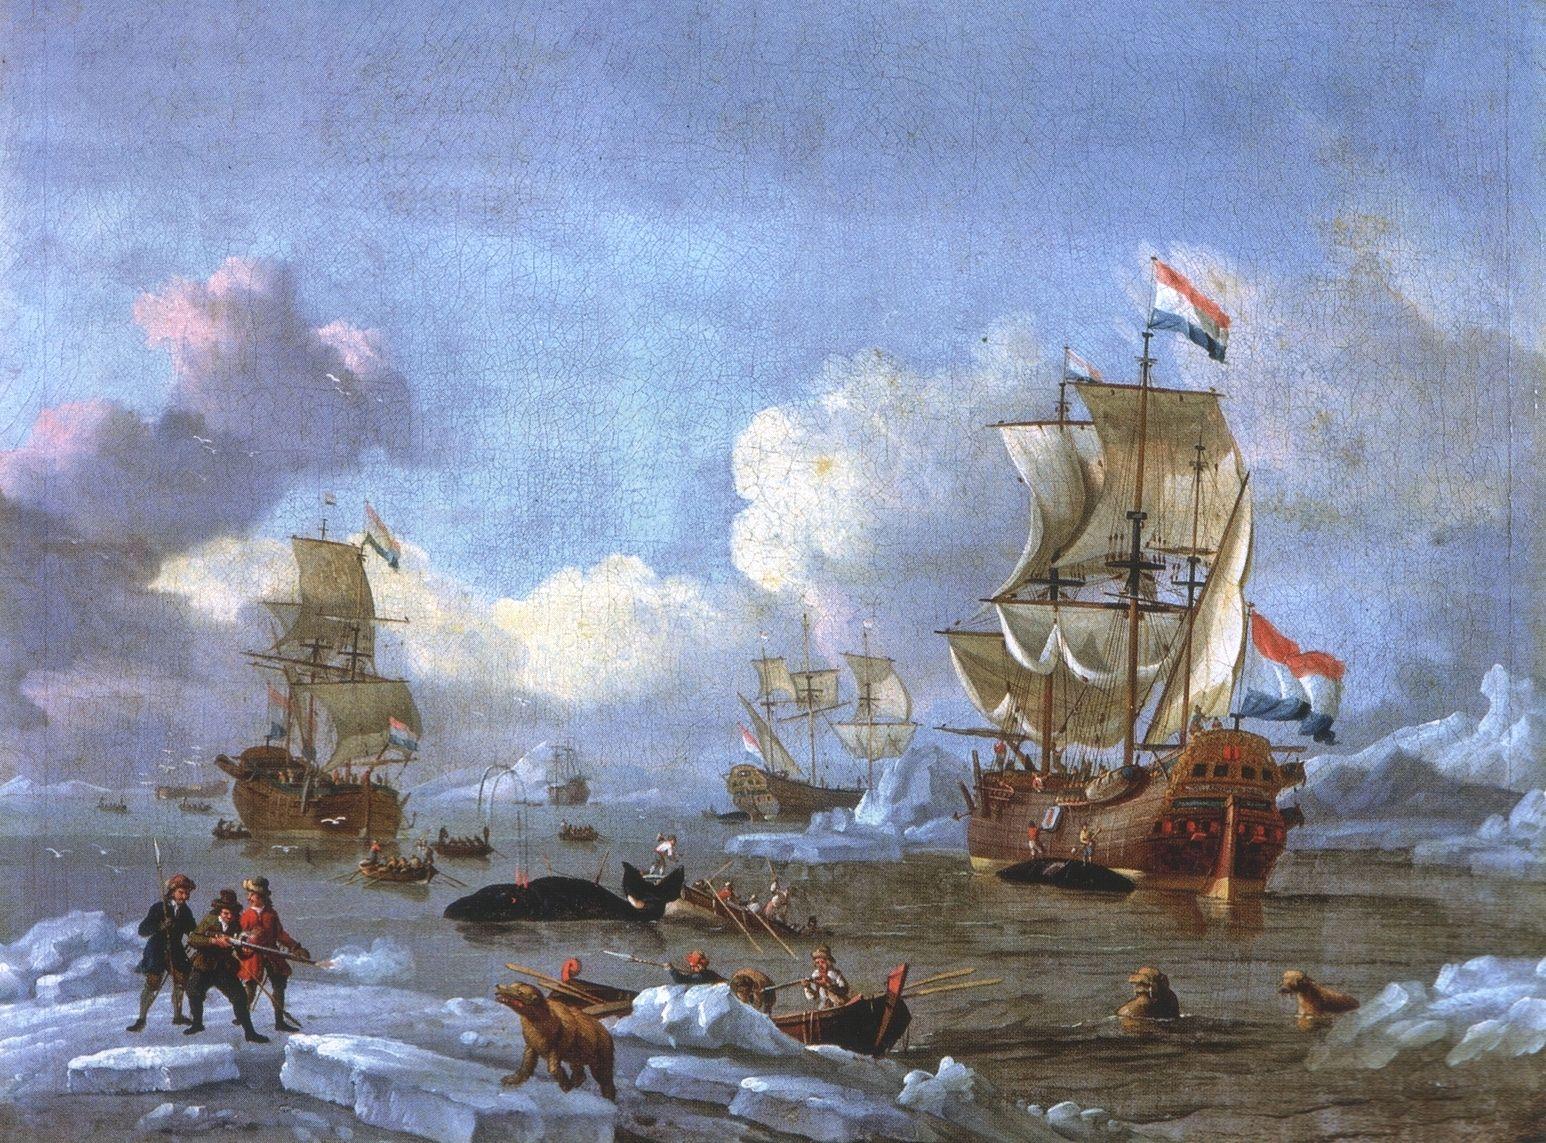 Abraham Storck Whaling in the Arctic Ocean